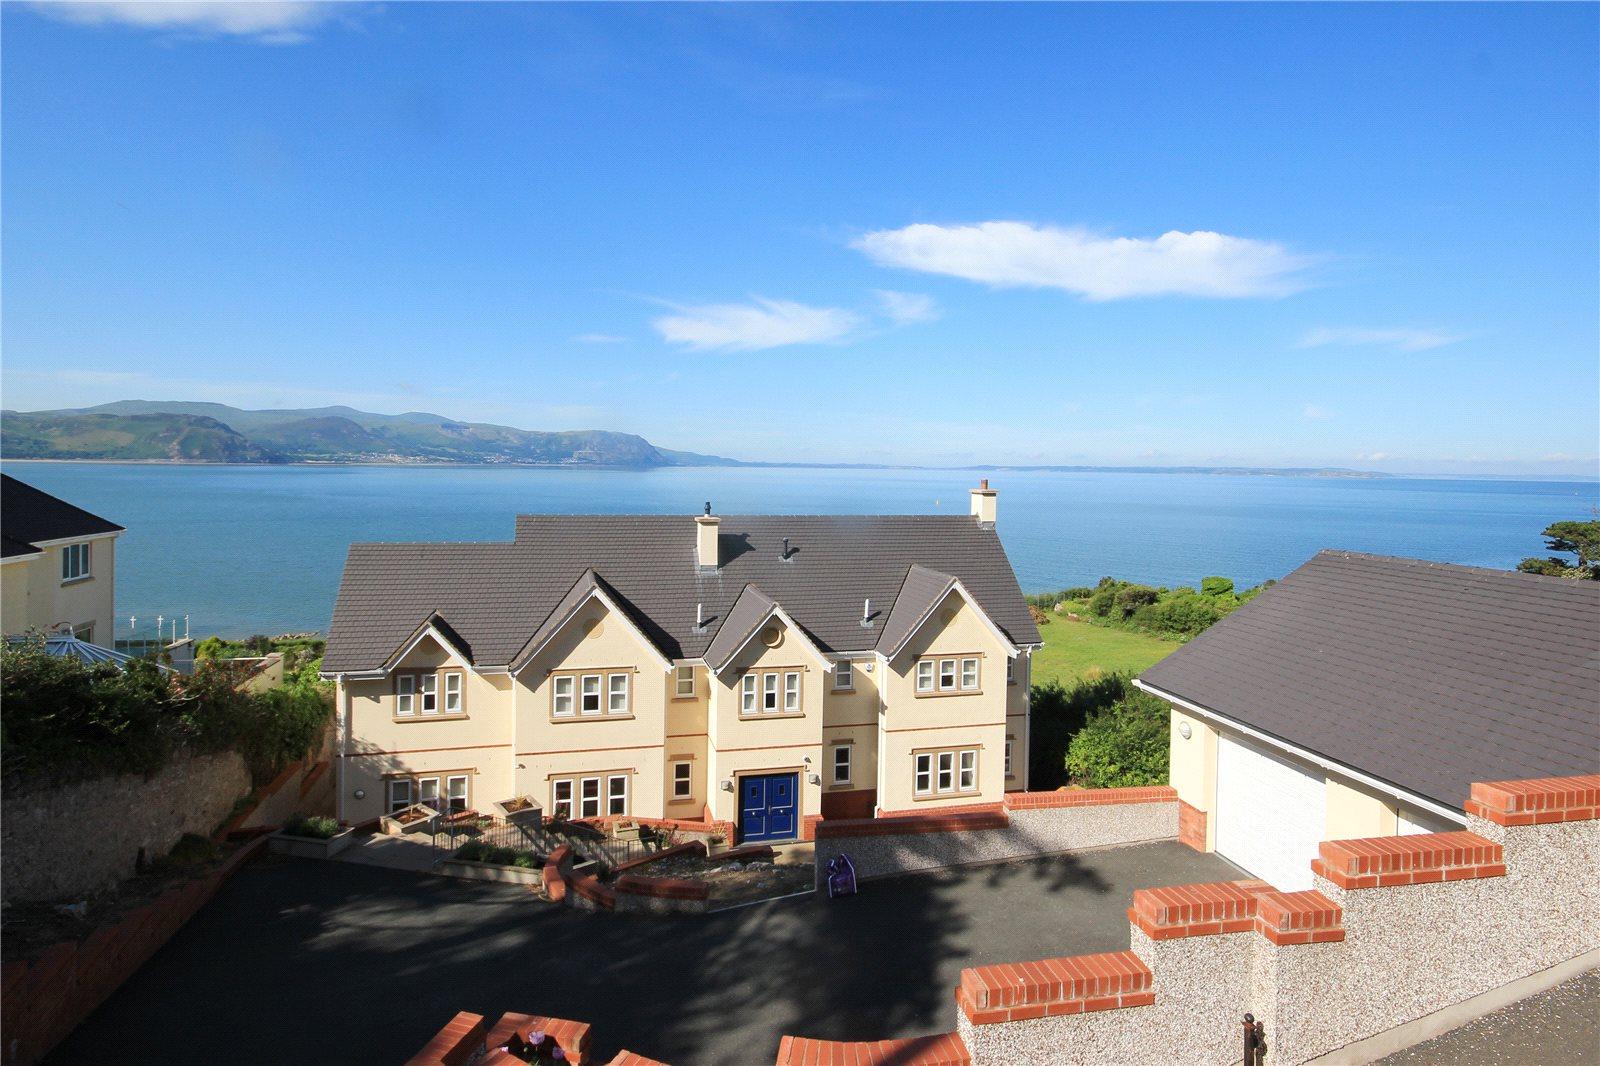 Maison unifamiliale pour l Vente à Llys Helyg Drive, Llandudno, Conwy, LL30 Conwy, Wales